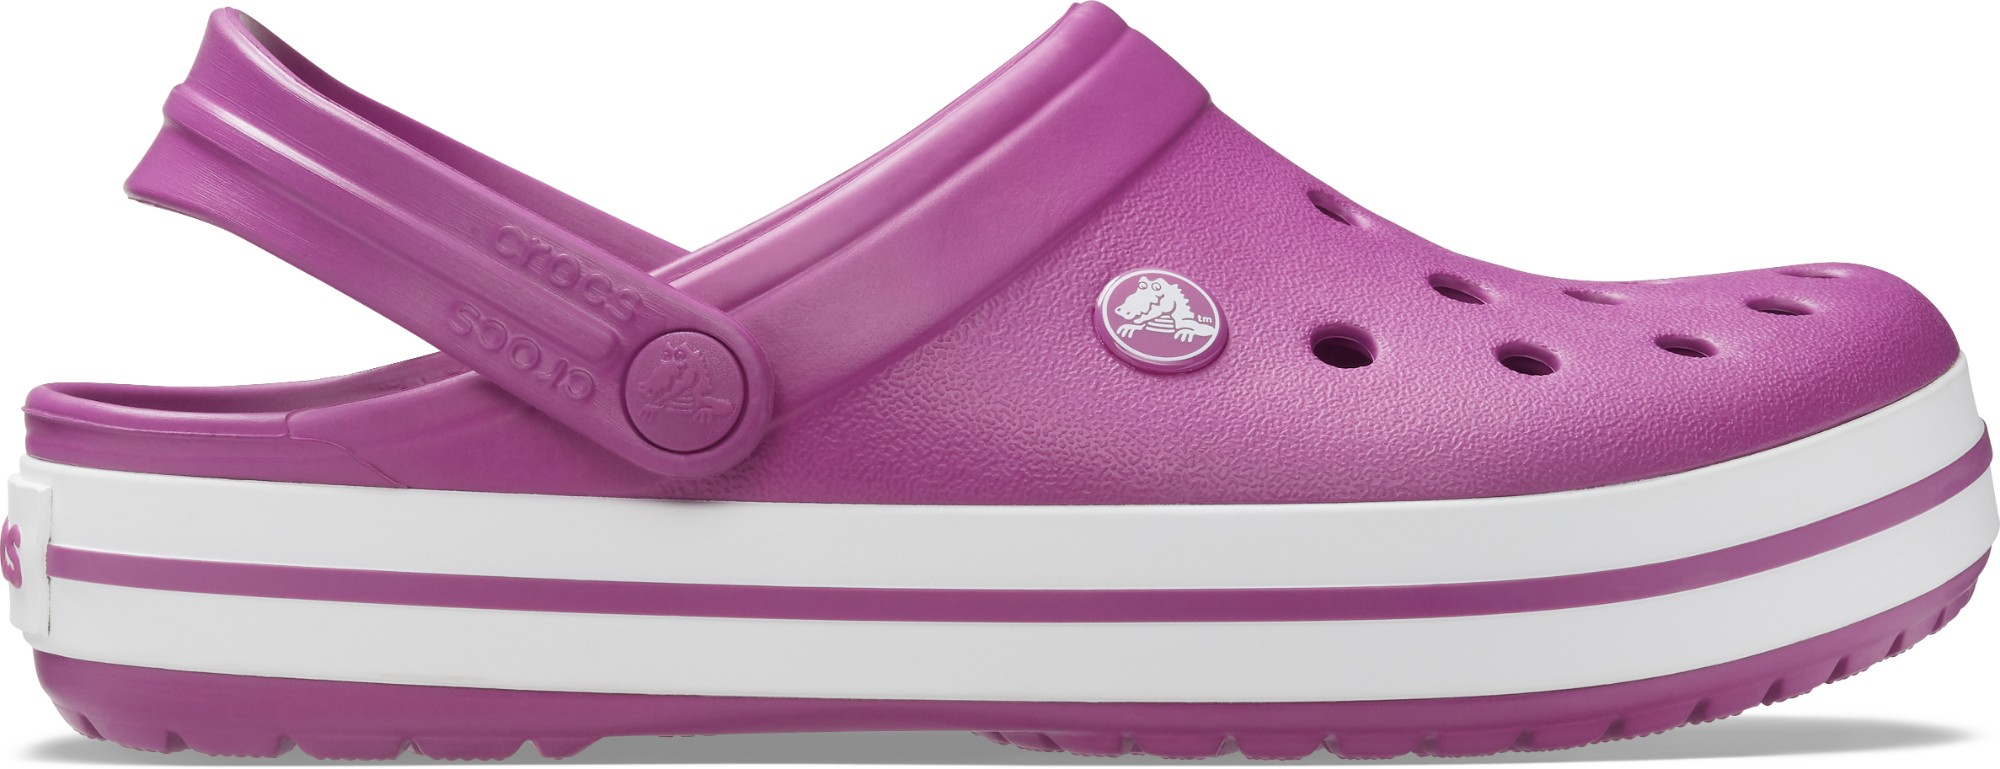 Crocs™ Crocband™ Viola 41